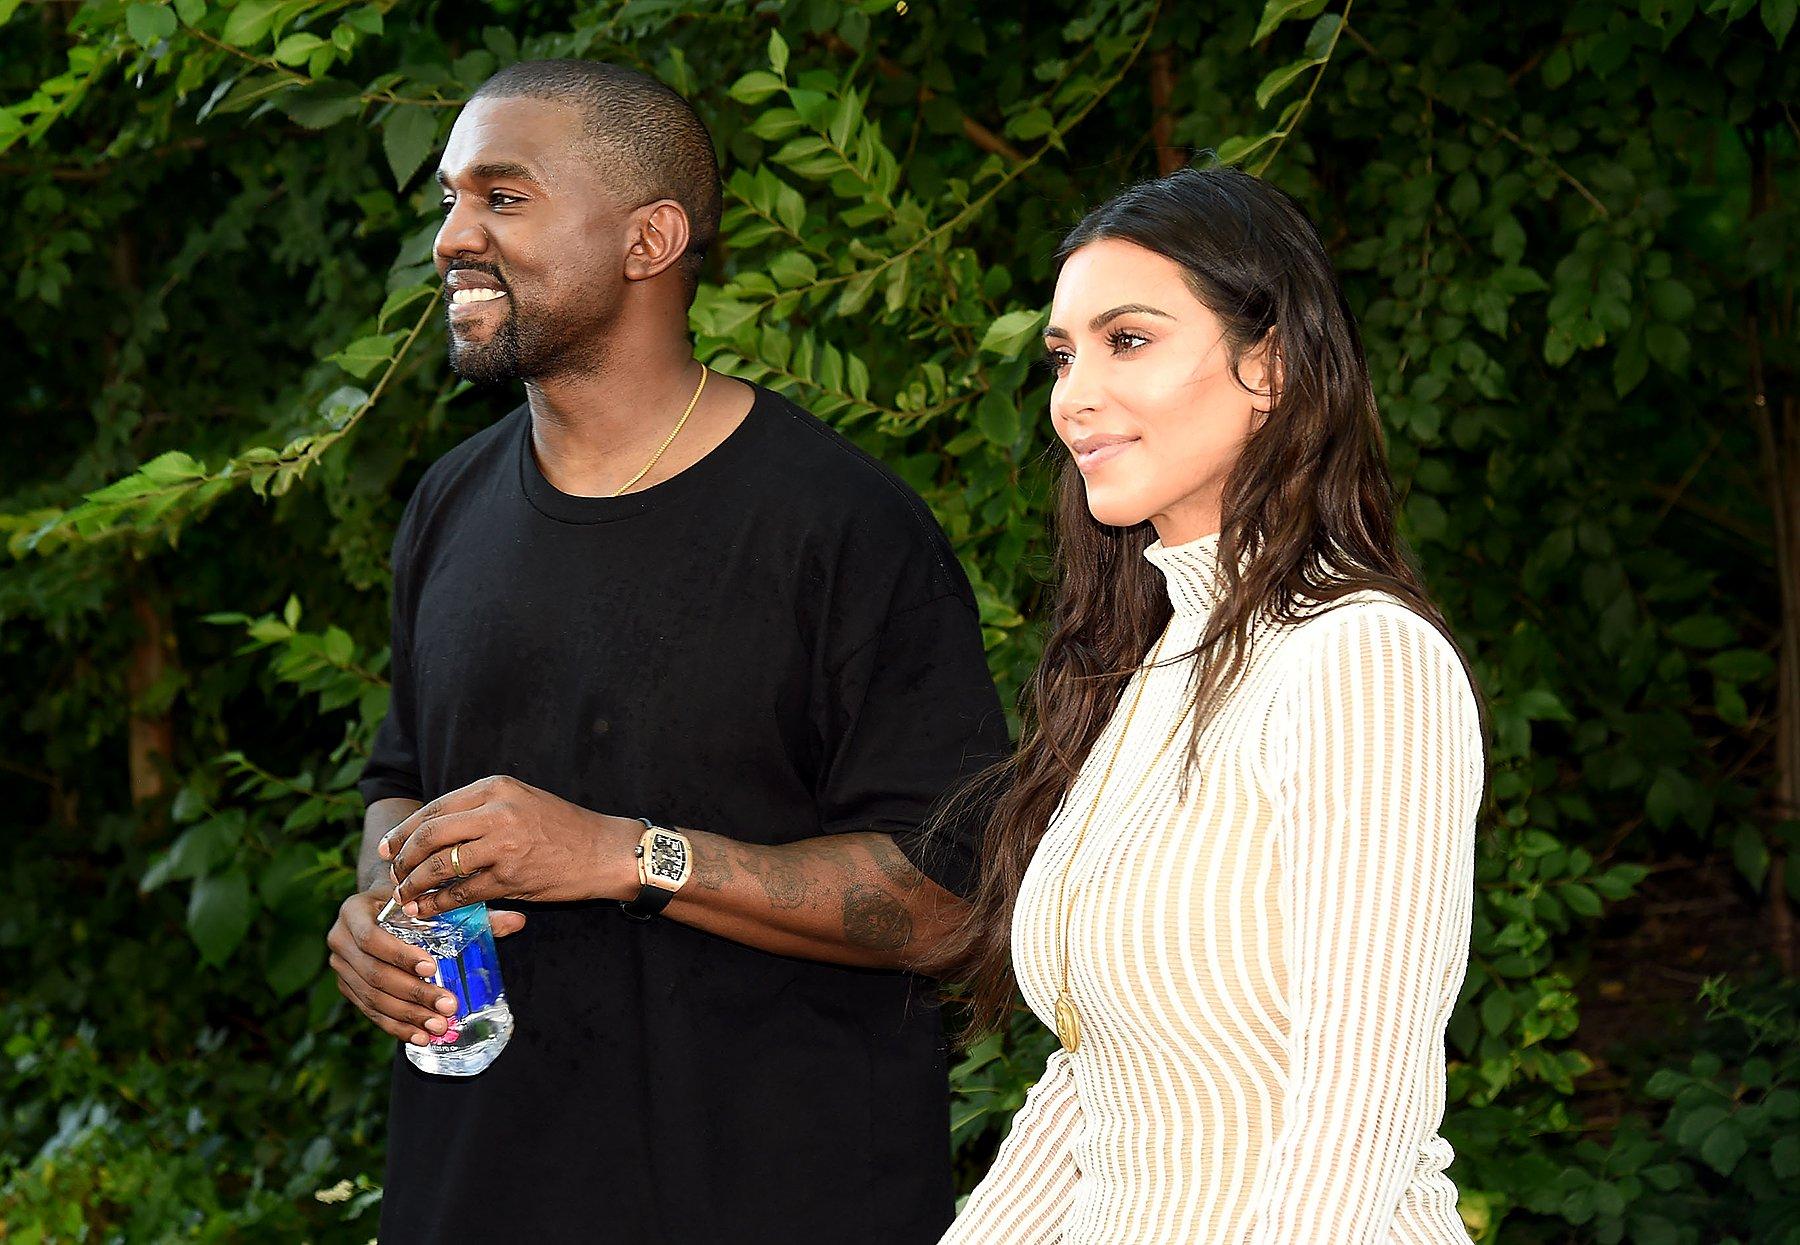 Kim Kardashian and Kanye West are splitting up ���� https://t.co/epwKG7aSBg https://t.co/u7qqojWVlR